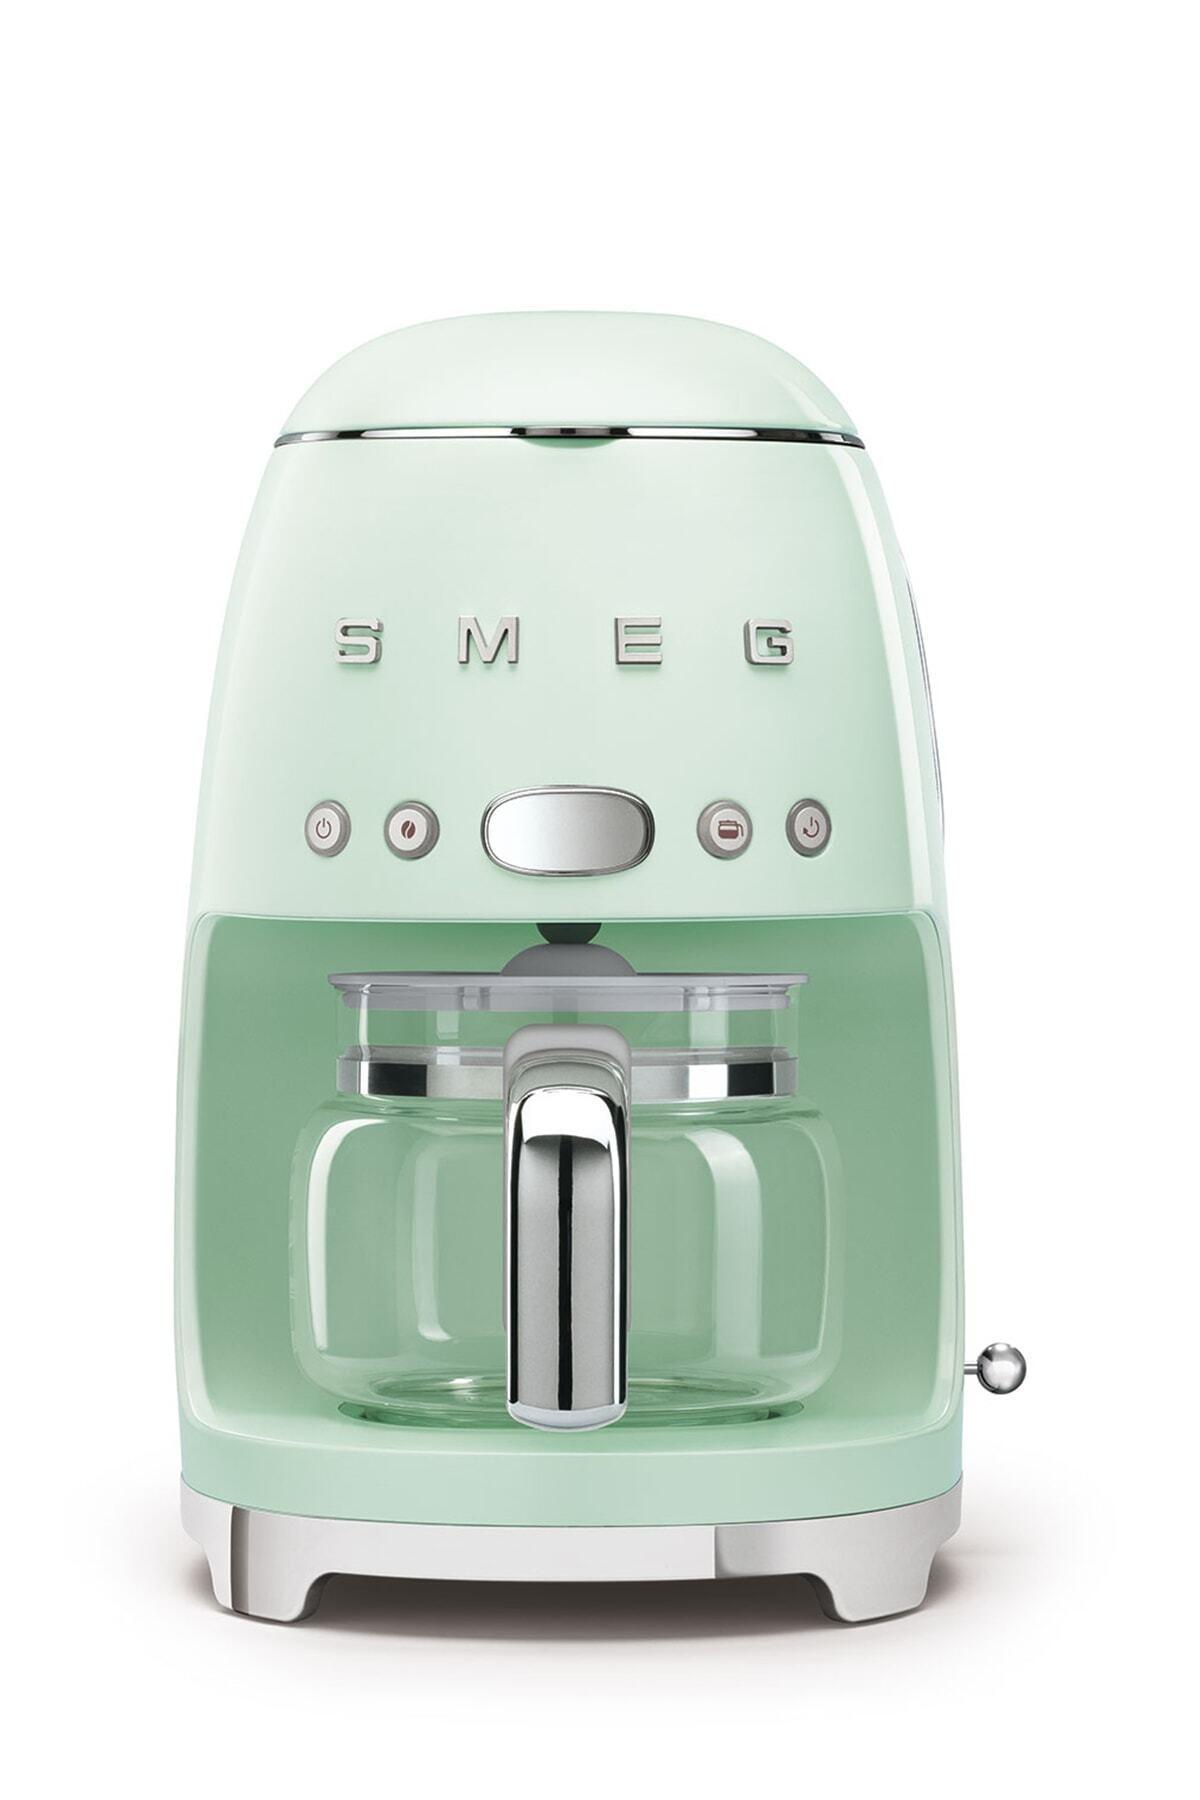 SMEG Pastel Yeşil Boyalı Çelik Kasa Filtre Kahve Makinesi Dcf02pgeu 2